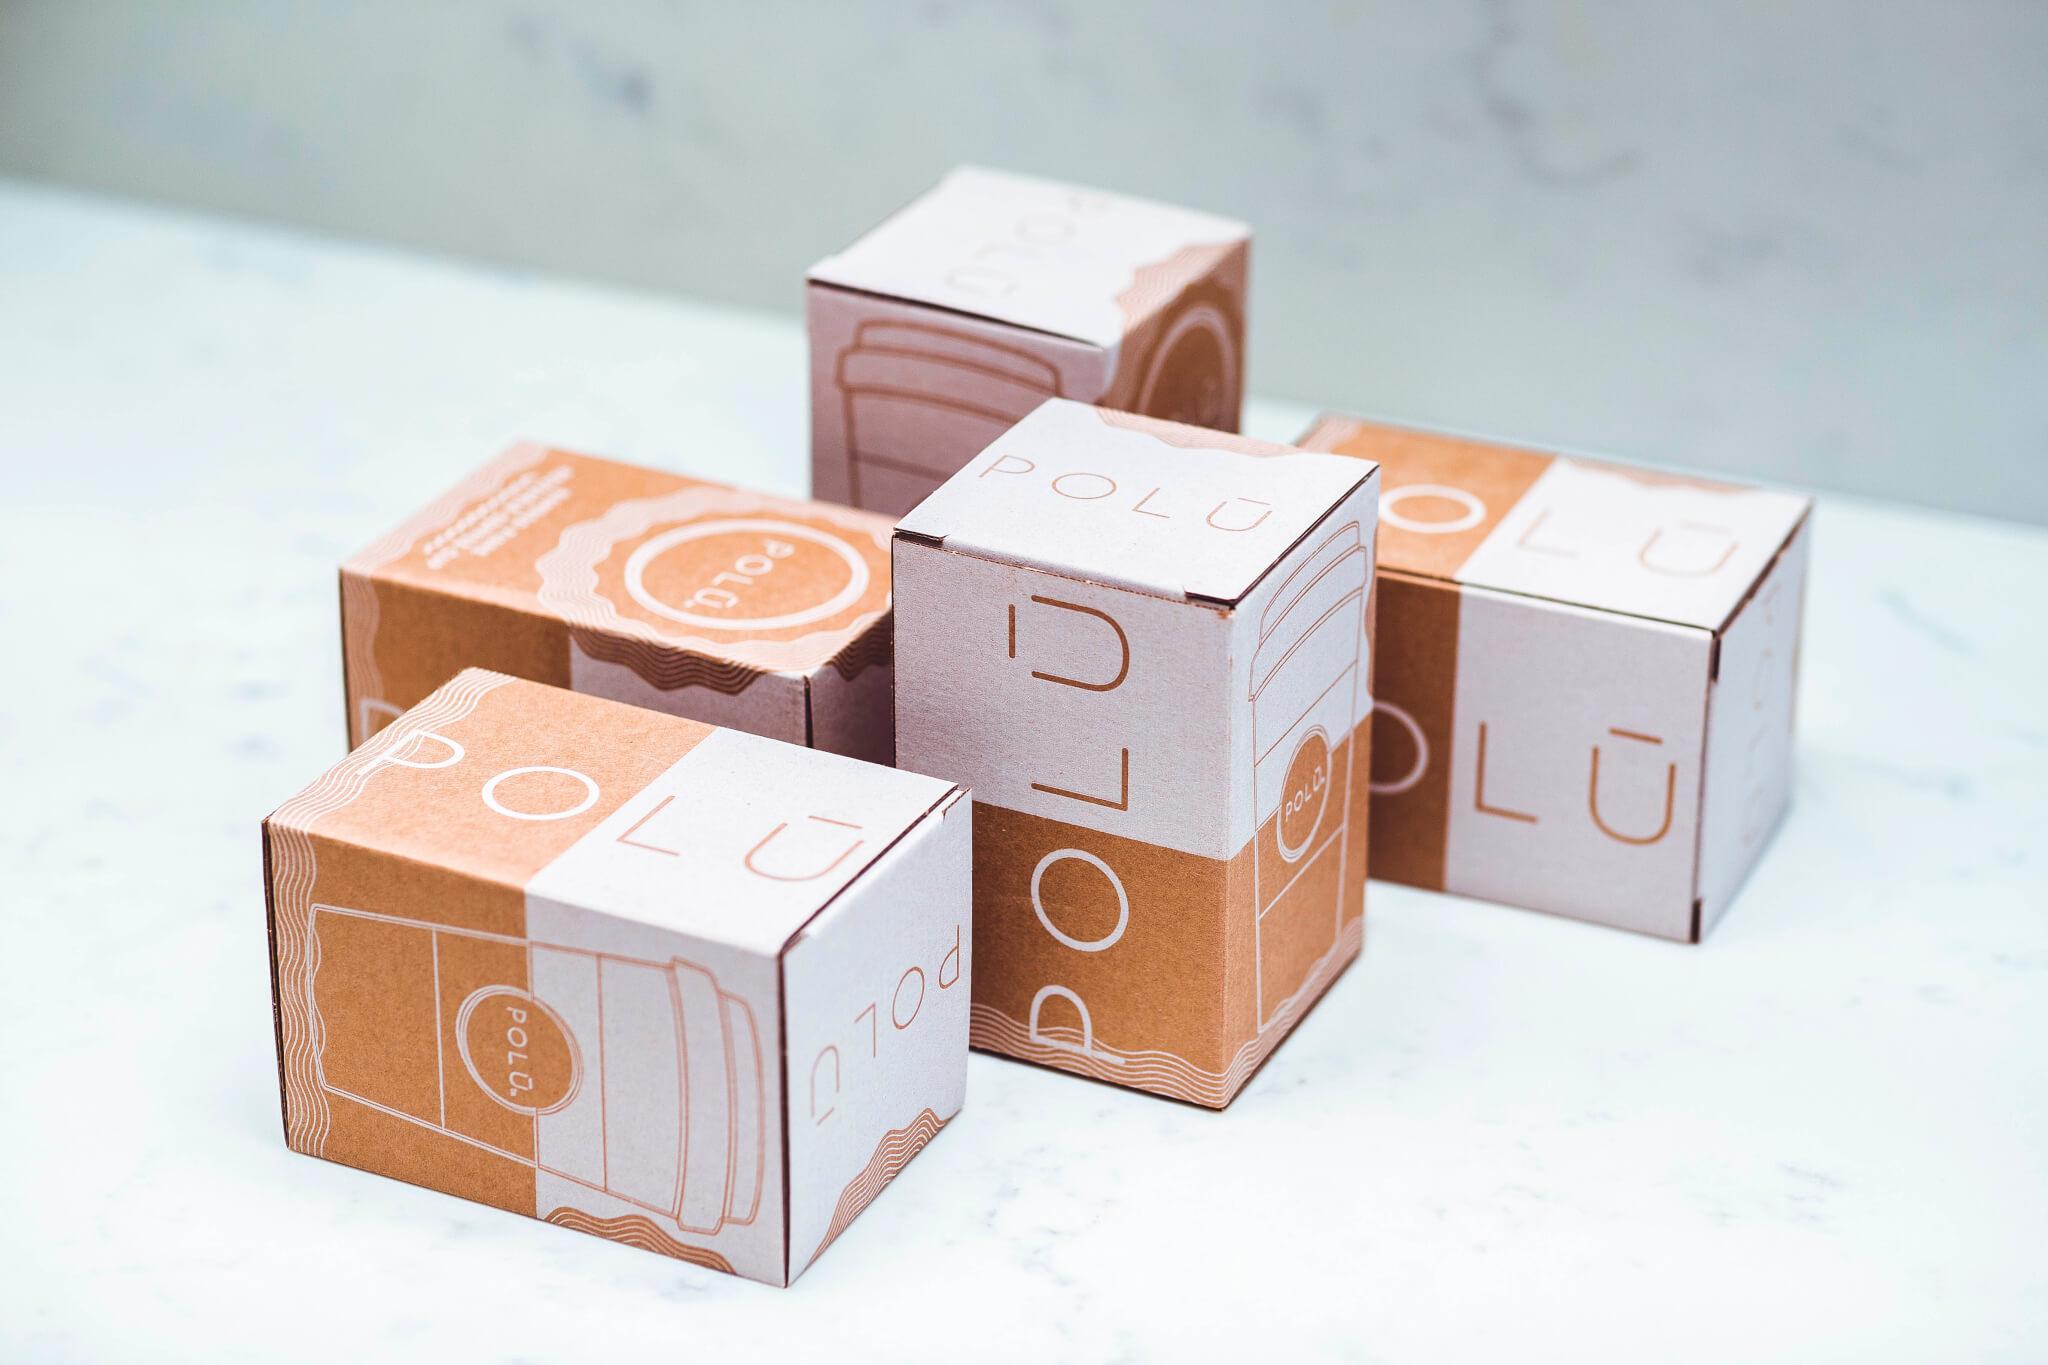 Polu Kraftkarton-Verpackung